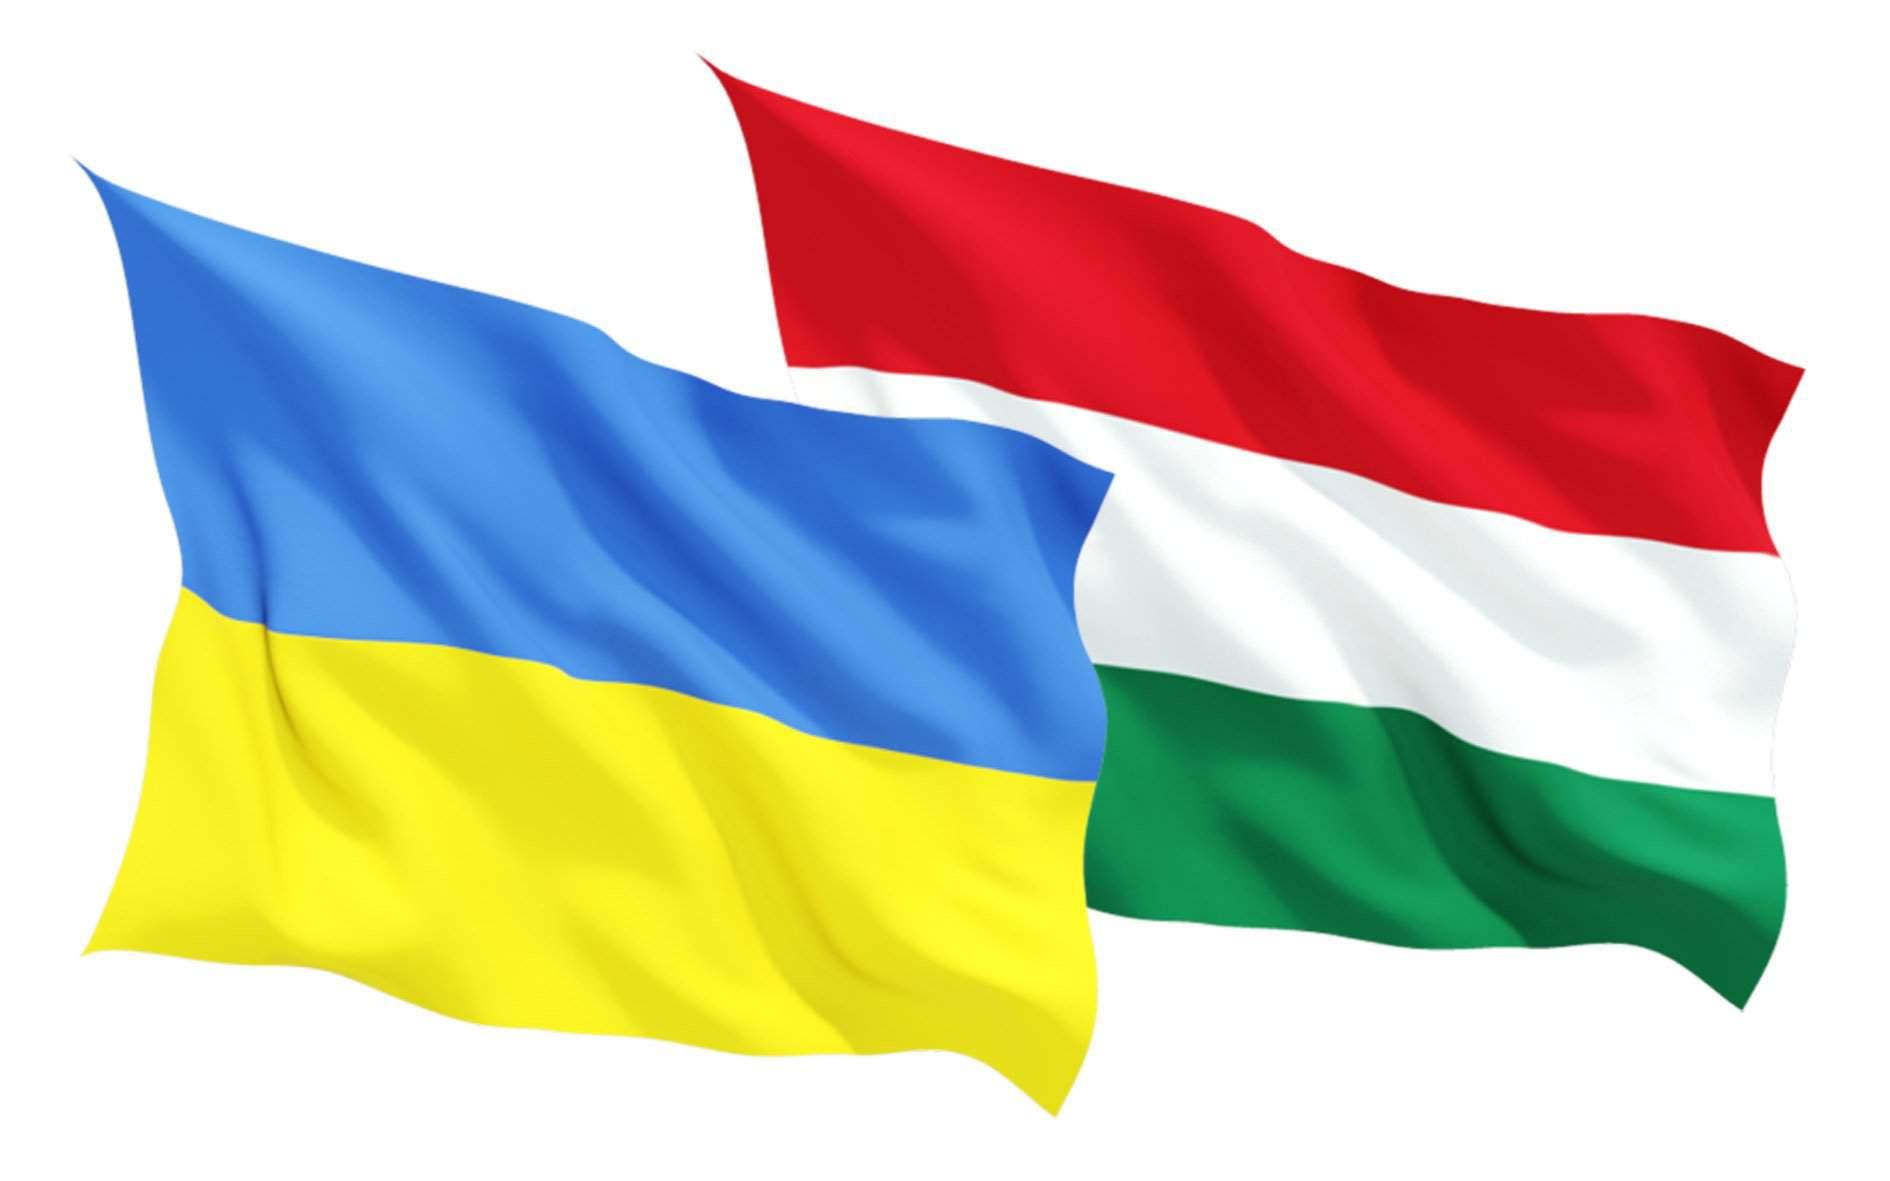 Ukraine tolerant of its ethnic minorities, says Prime Minister Groysman